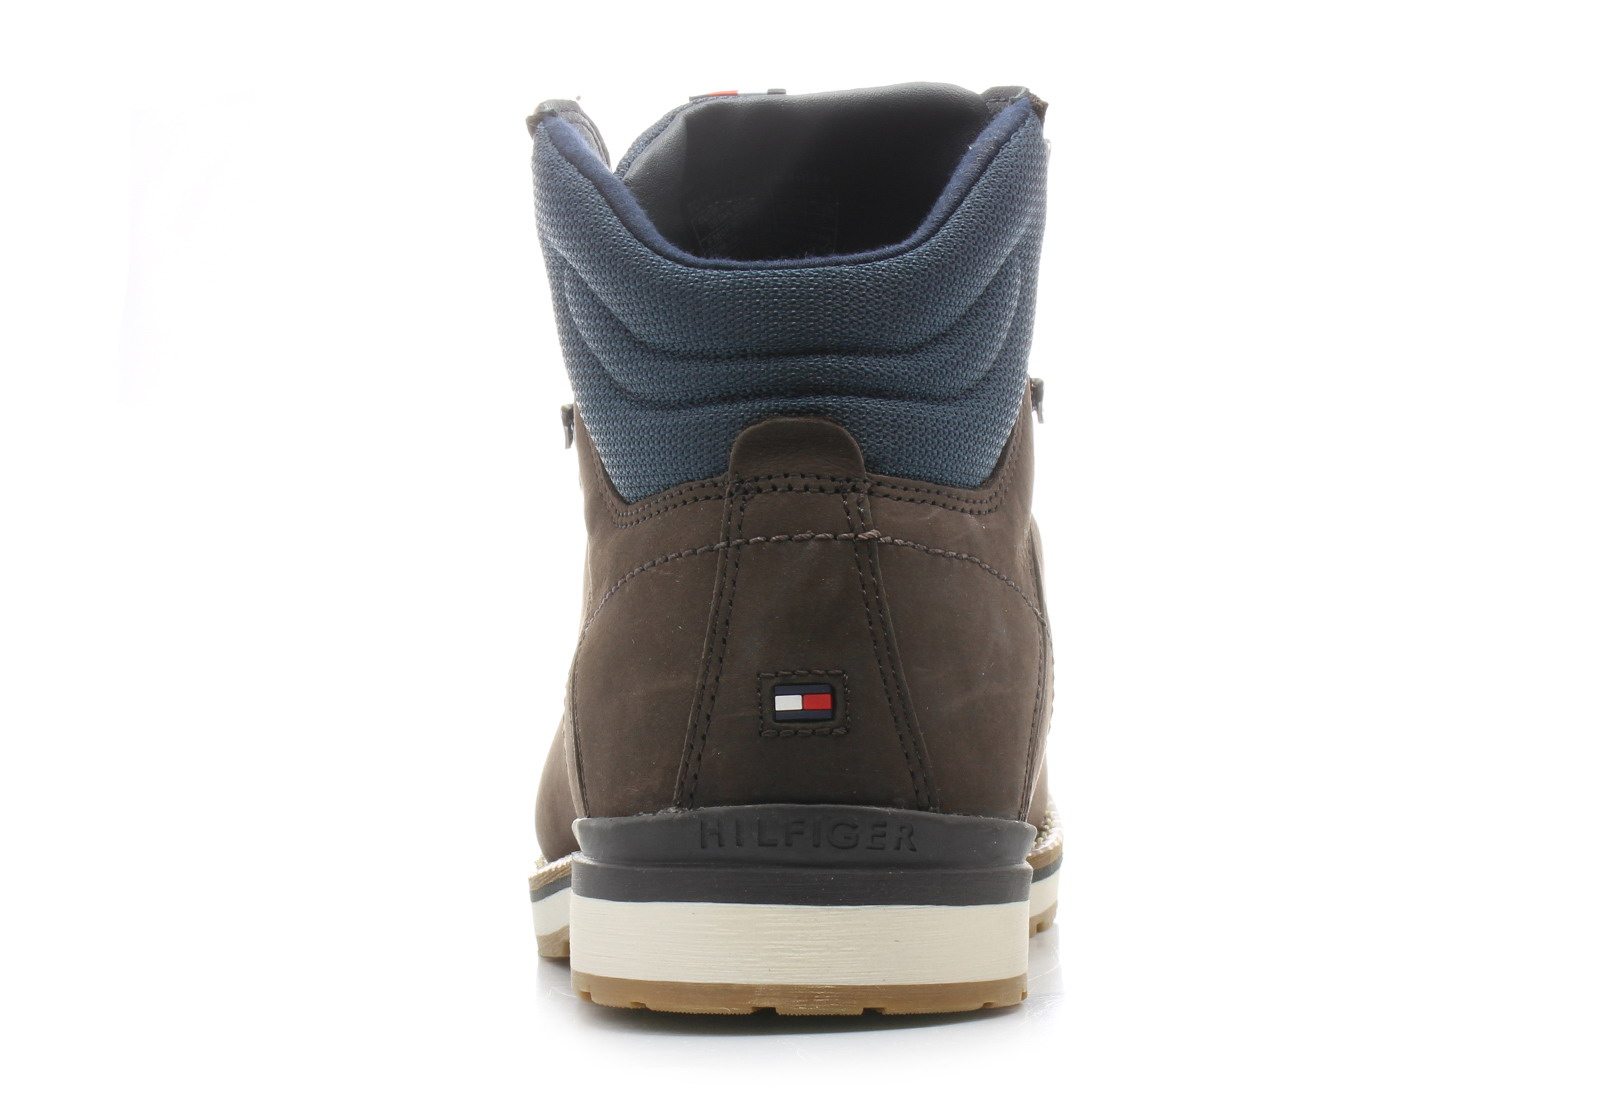 Tommy Hilfiger Bakancs - Rover 4c - 18F-1755-211 - Office Shoes ... c72fca83c0